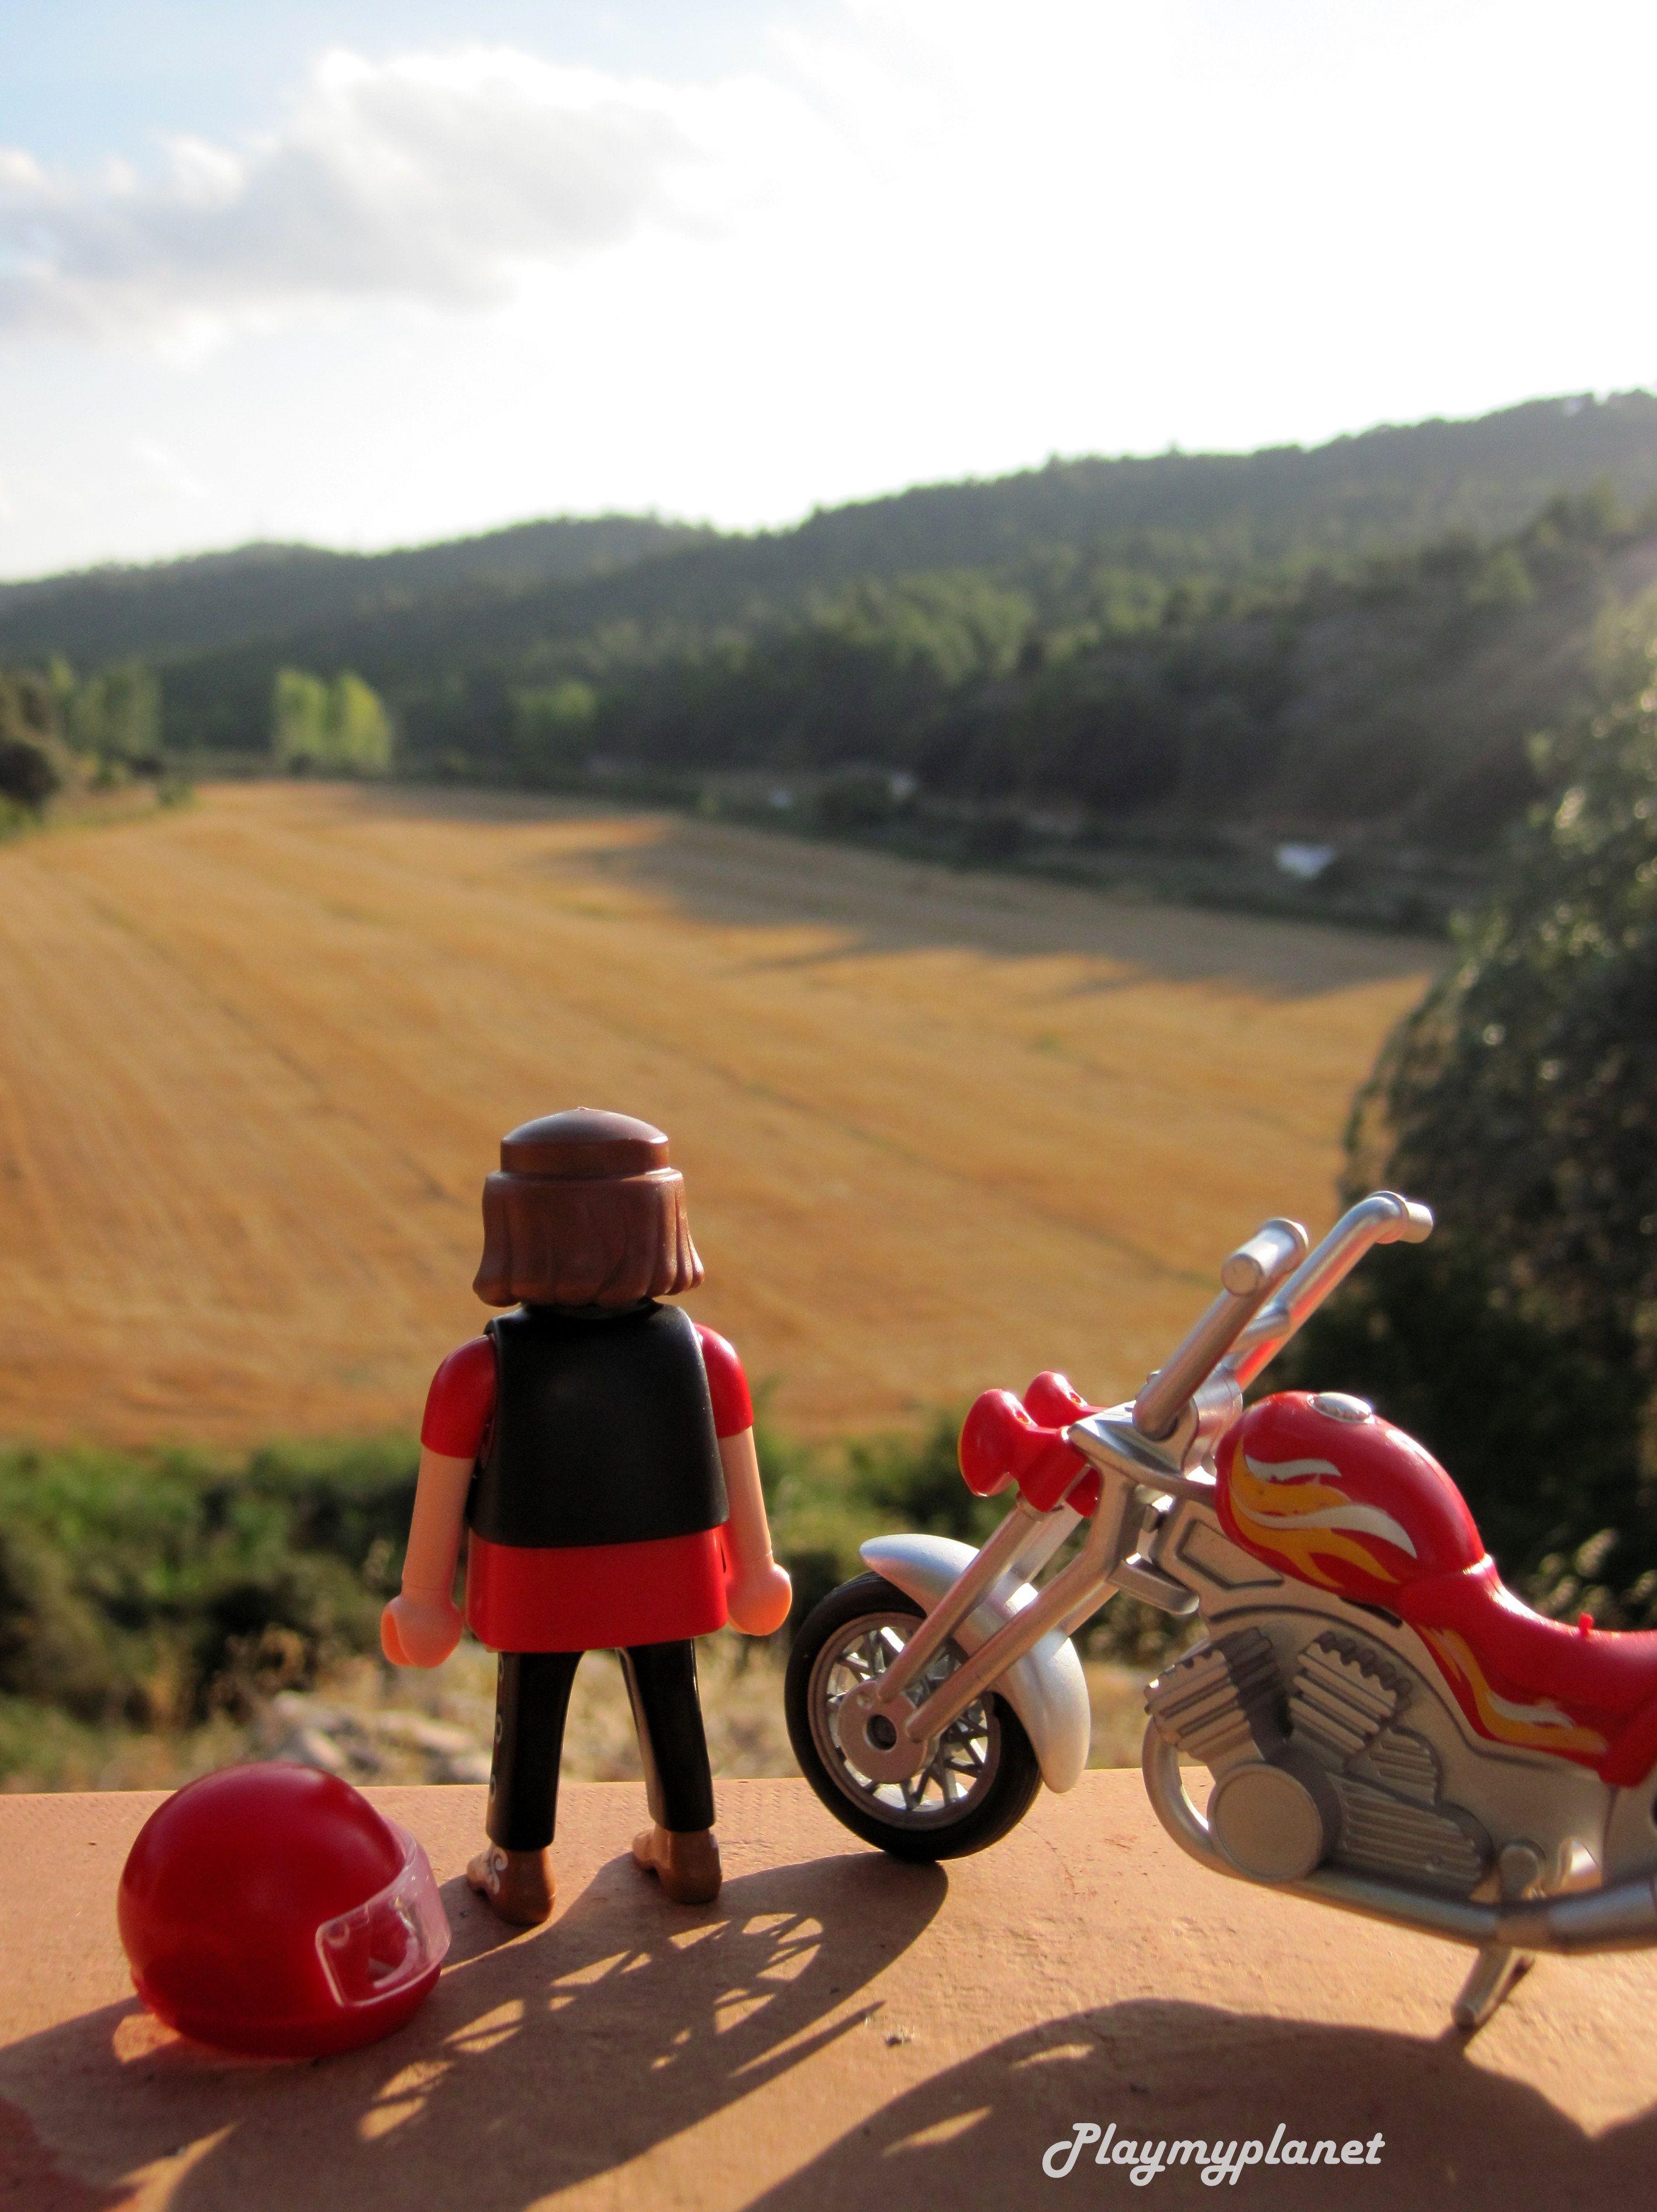 If It Was A Boy Steveo Motorista Playmobil En Castilla La Mancha